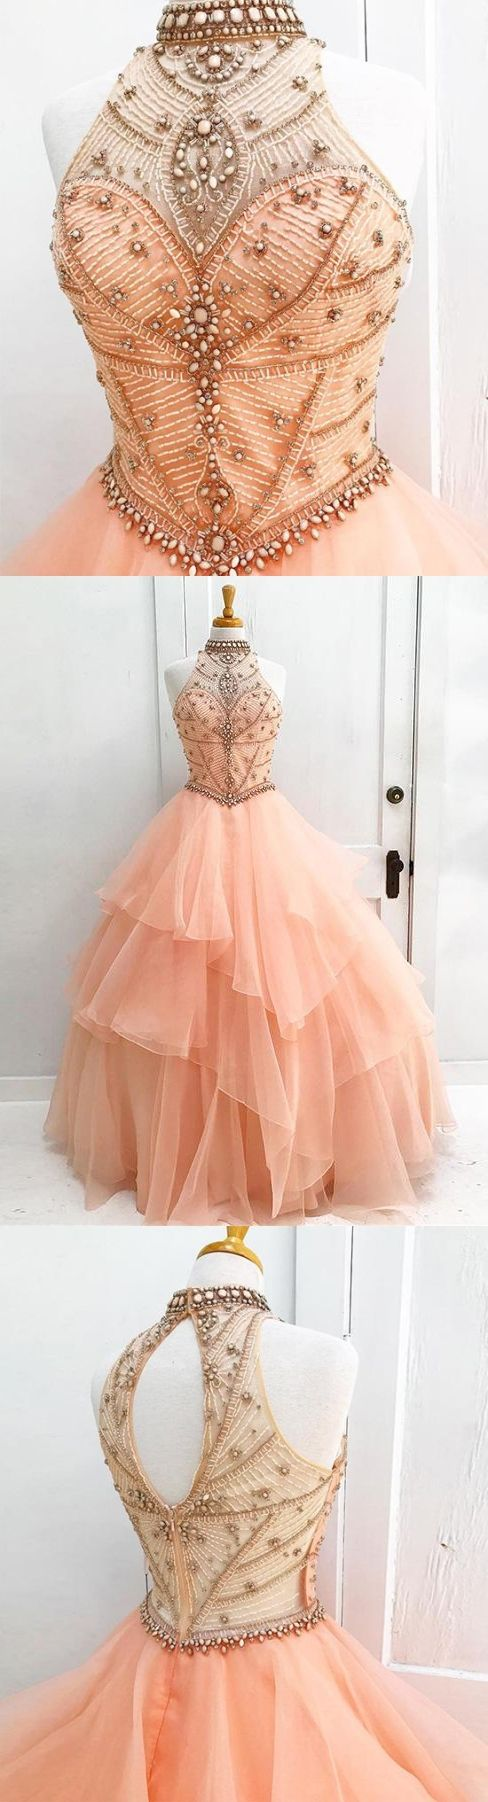 Ball gown prom dresses rhinestone beading floorlength sexy prom